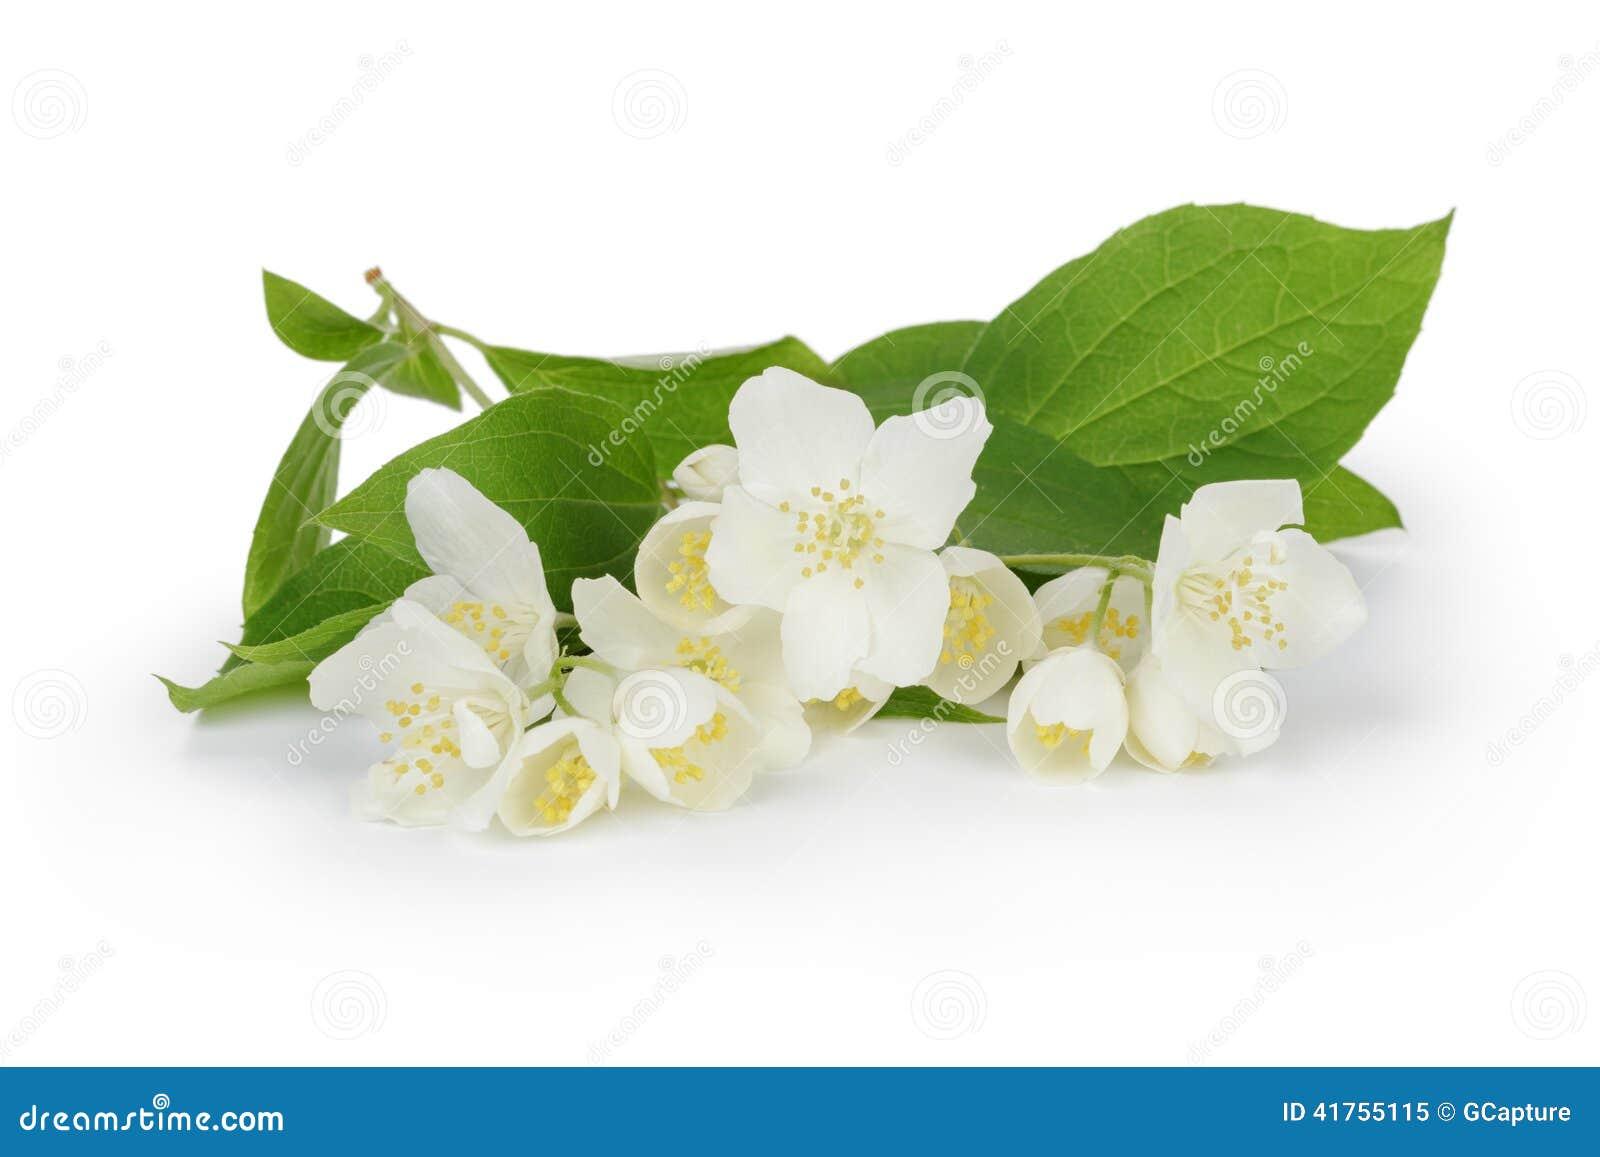 fresh jasmine flowers stock photo image 41755115. Black Bedroom Furniture Sets. Home Design Ideas